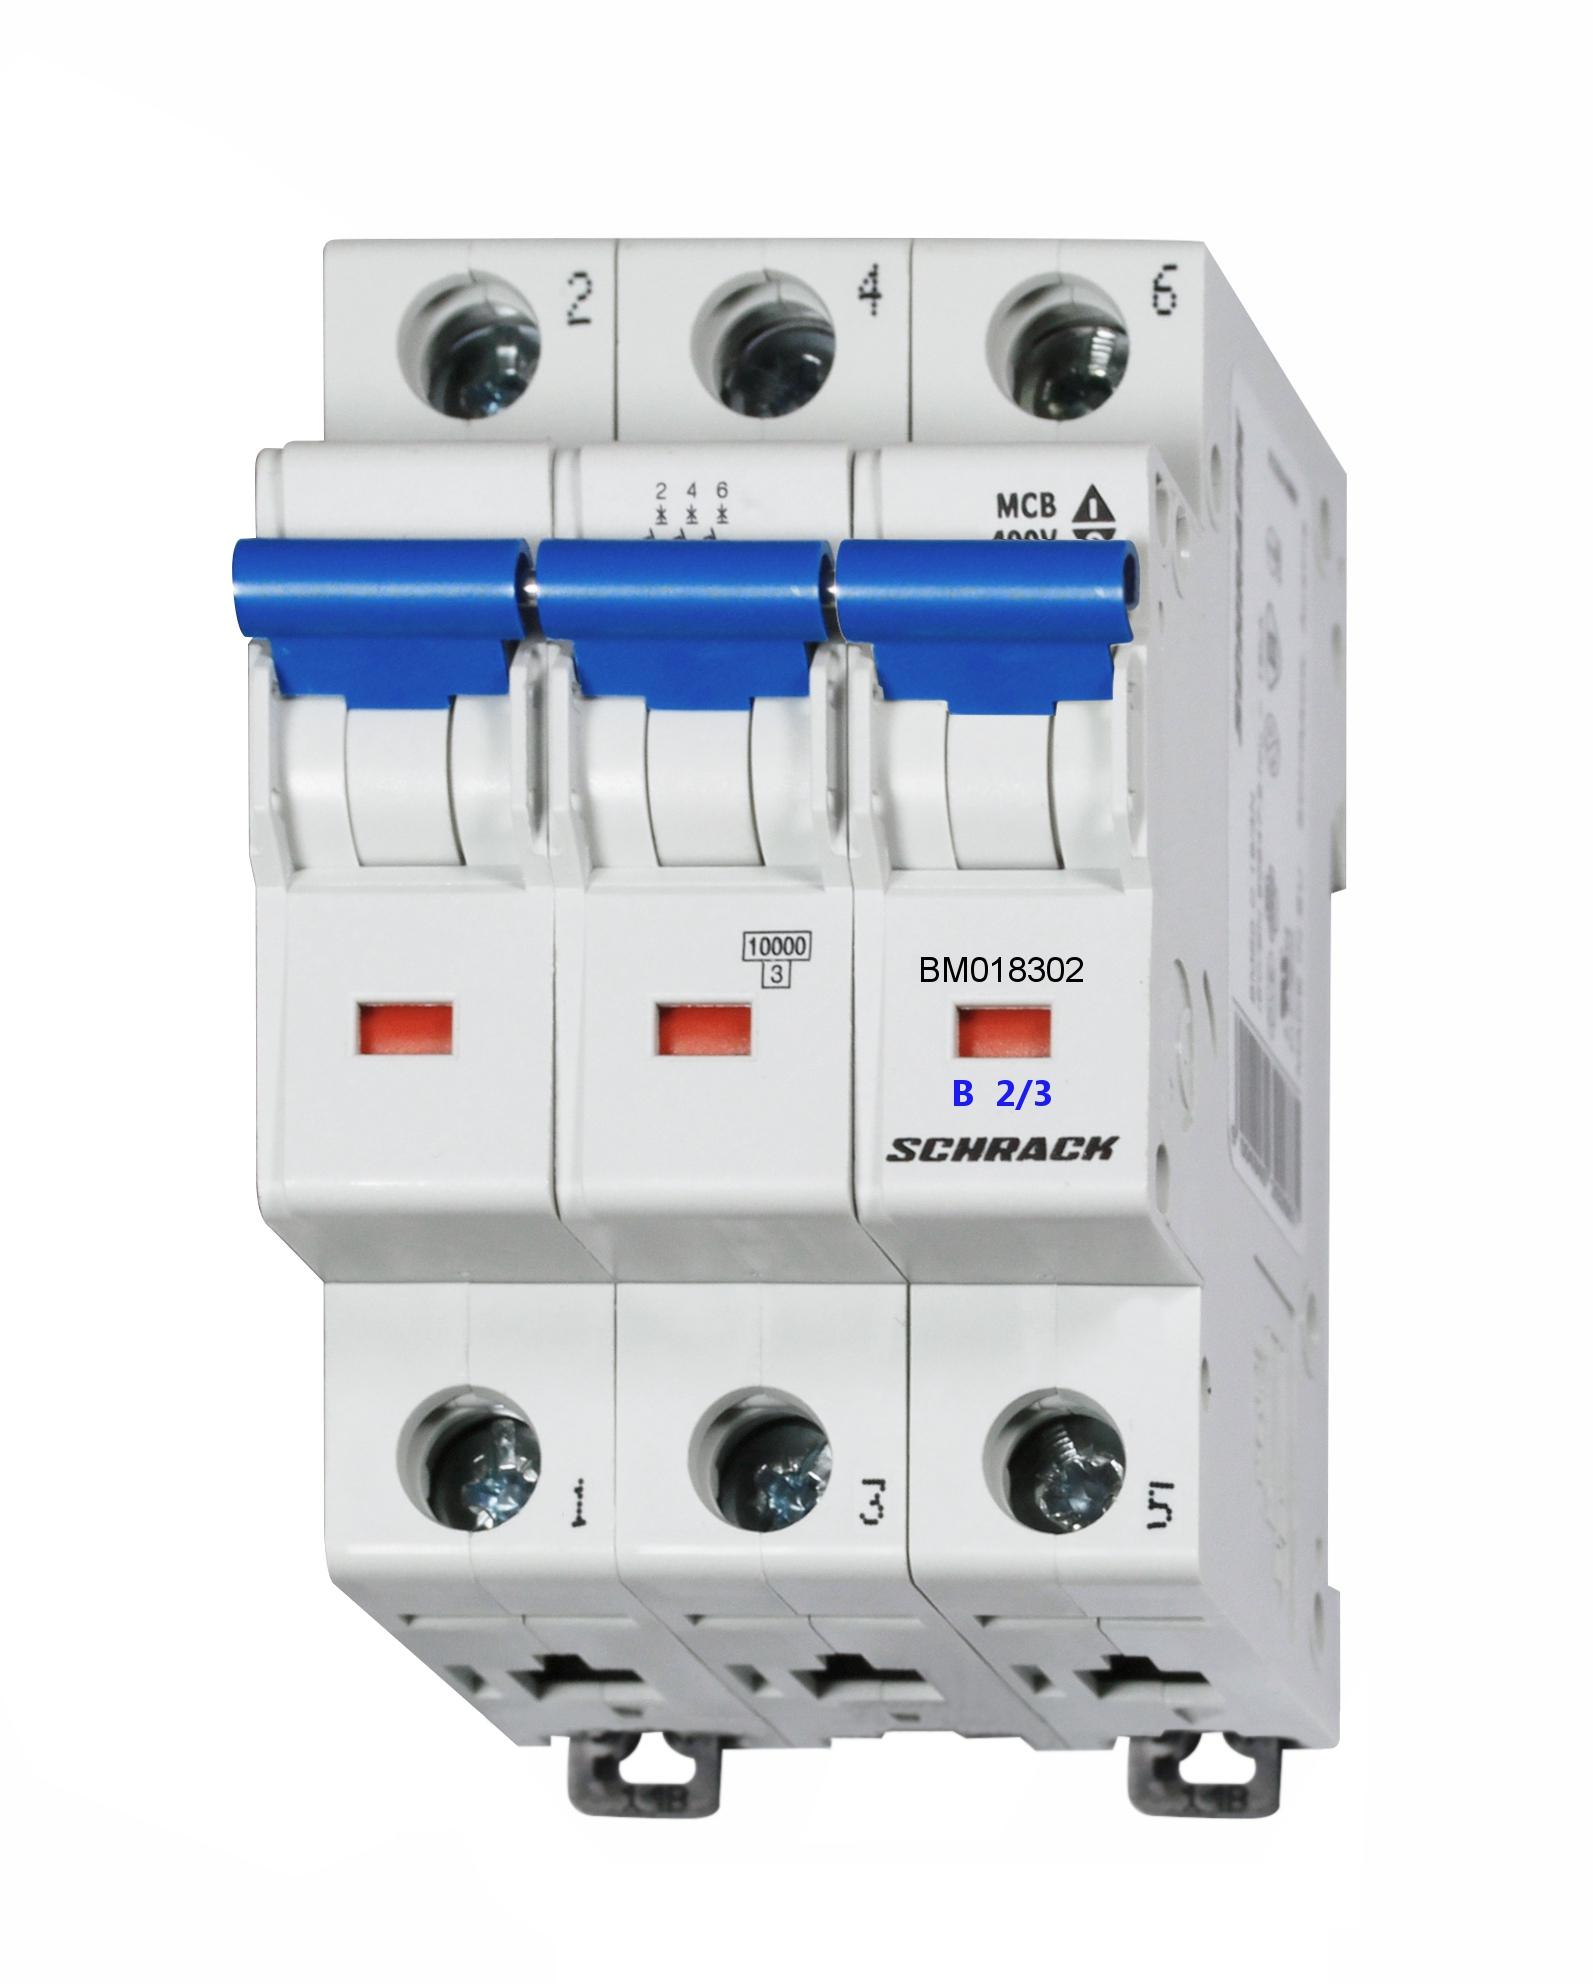 BM018302 - Schrack Technik